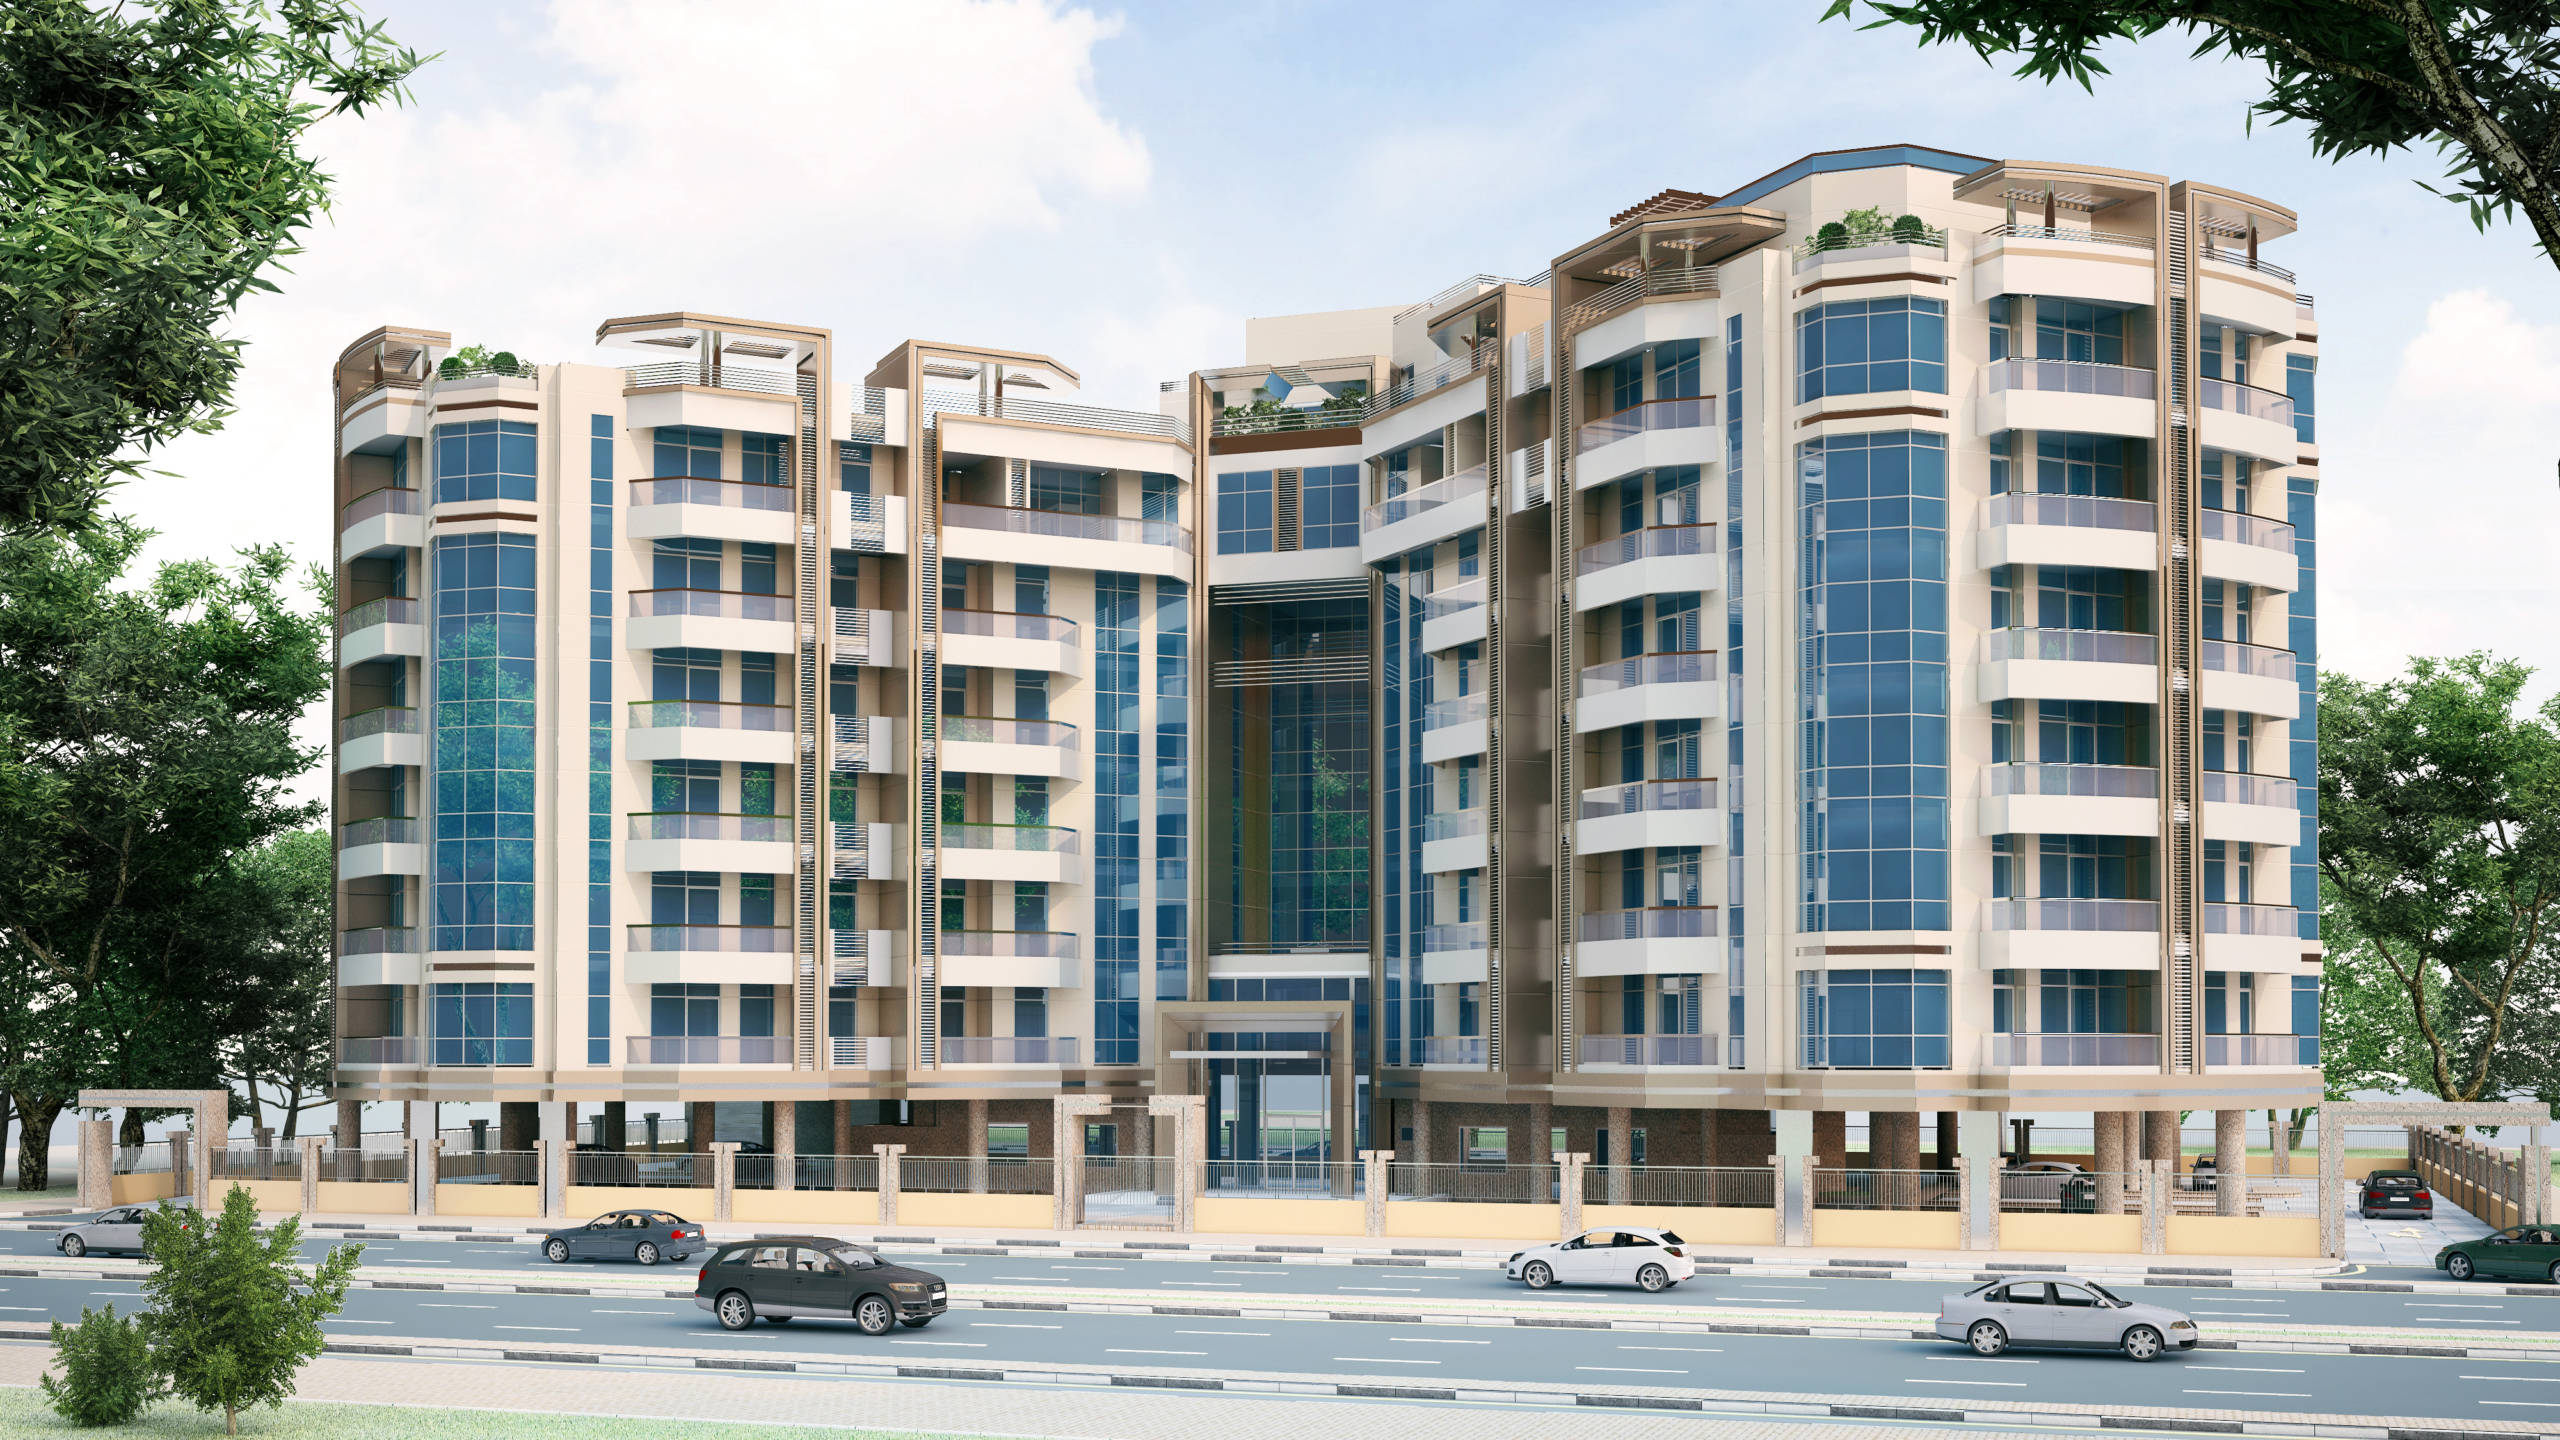 G+7 Residential Building – Dubai